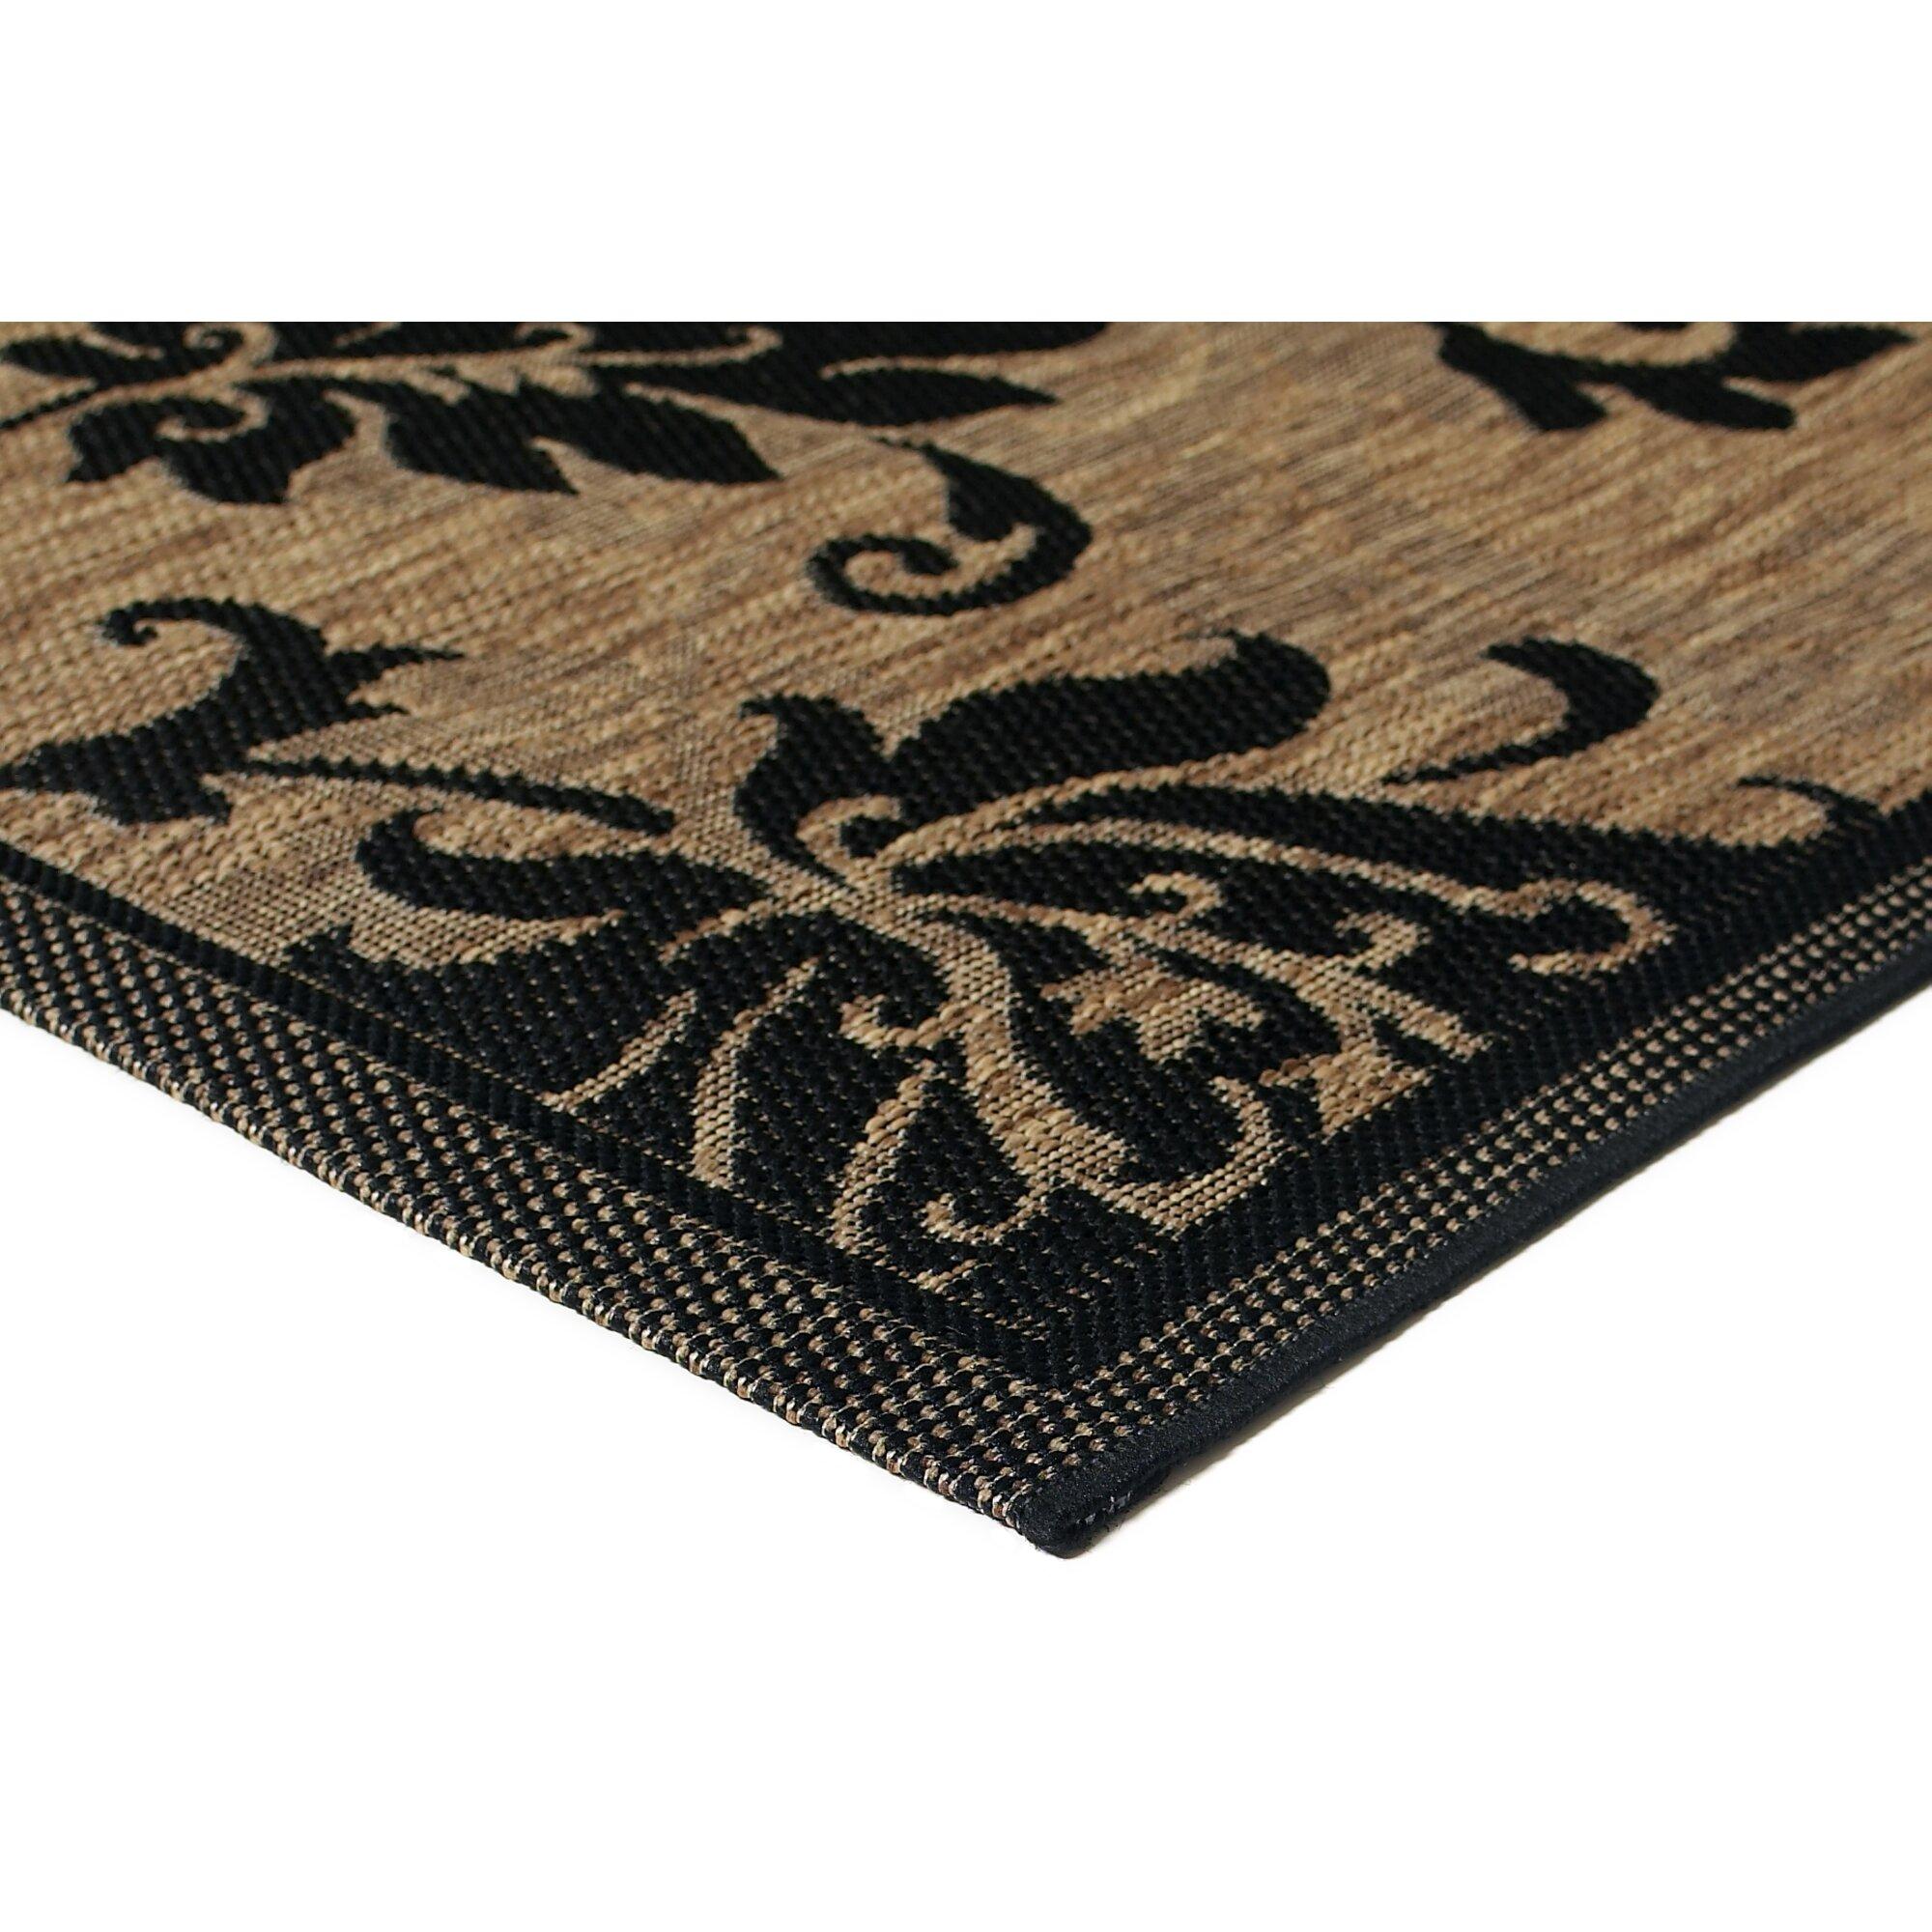 Balta fair haven black indoor outdoor area rug reviews for 10x10 area rug